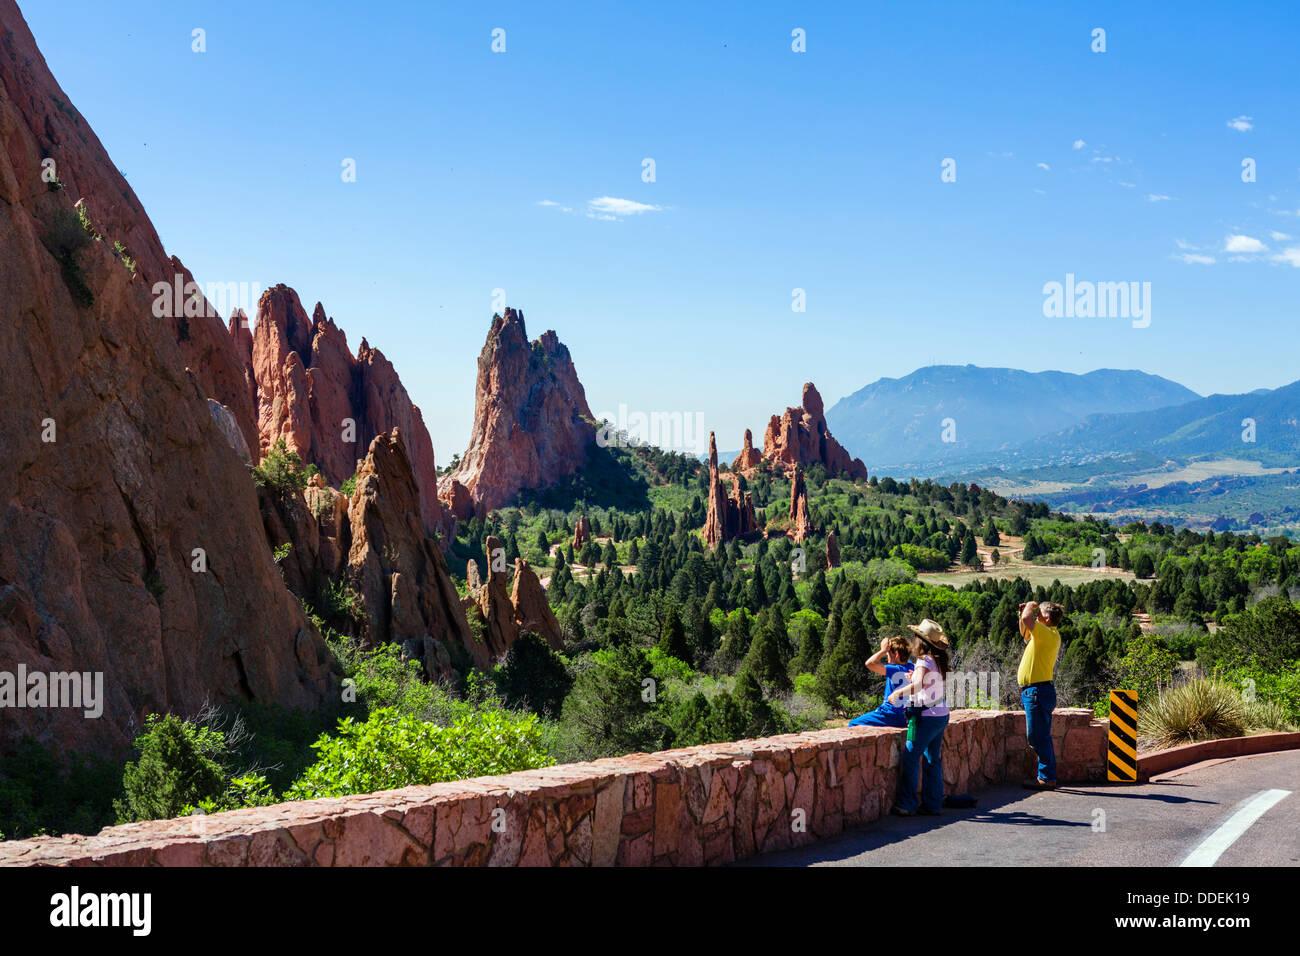 Family on the side of the road through Garden of The Gods public park, Colorado Springs, Colorado, USA - Stock Image